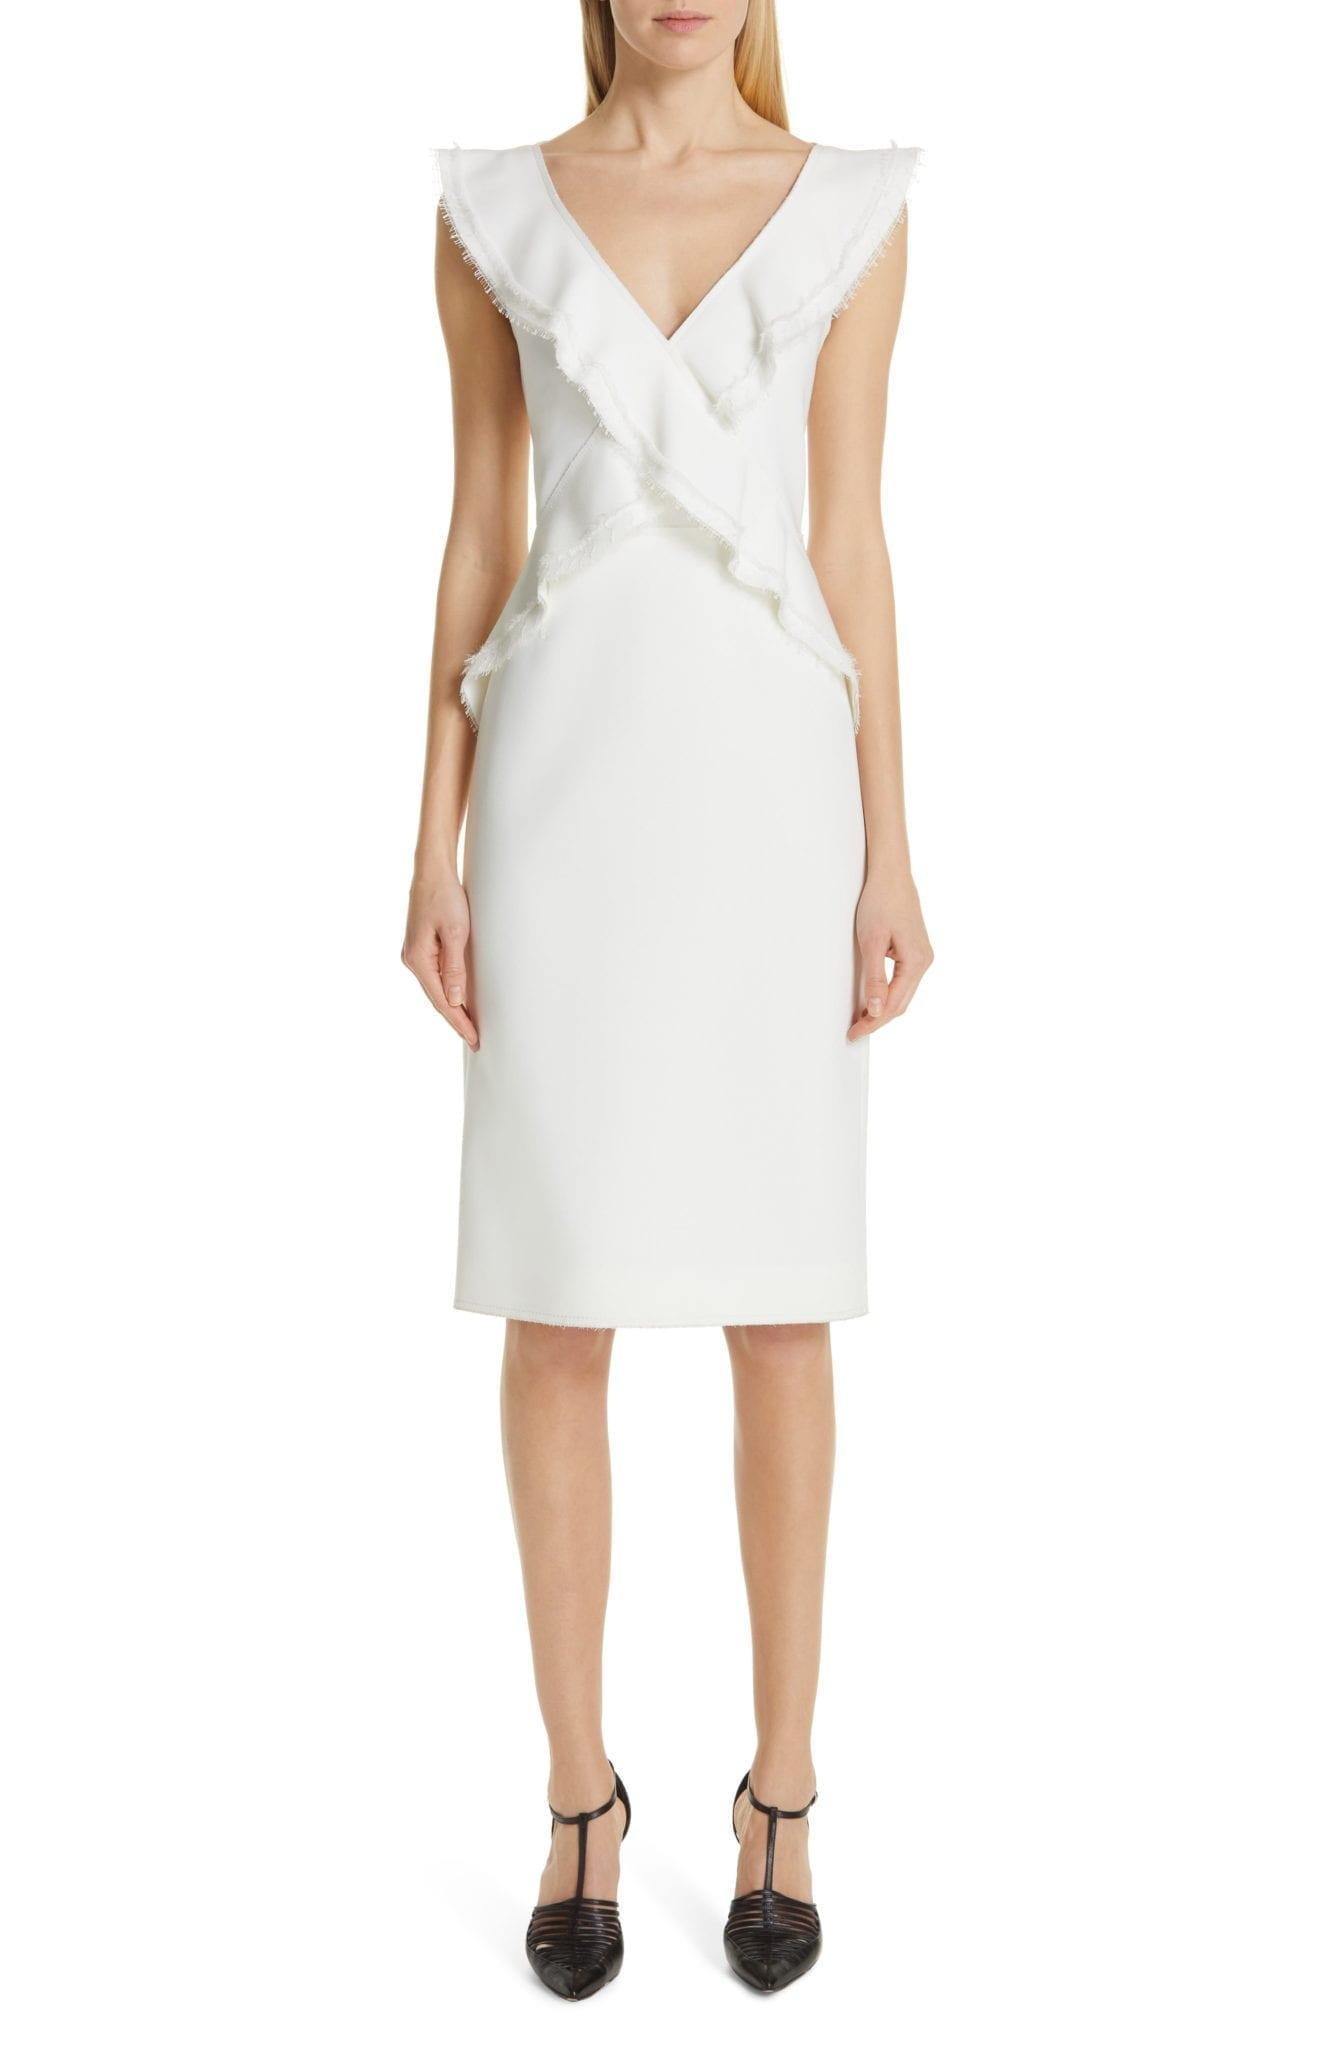 JASON WU COLLECTION Ruffle Compact Crepe White Dress